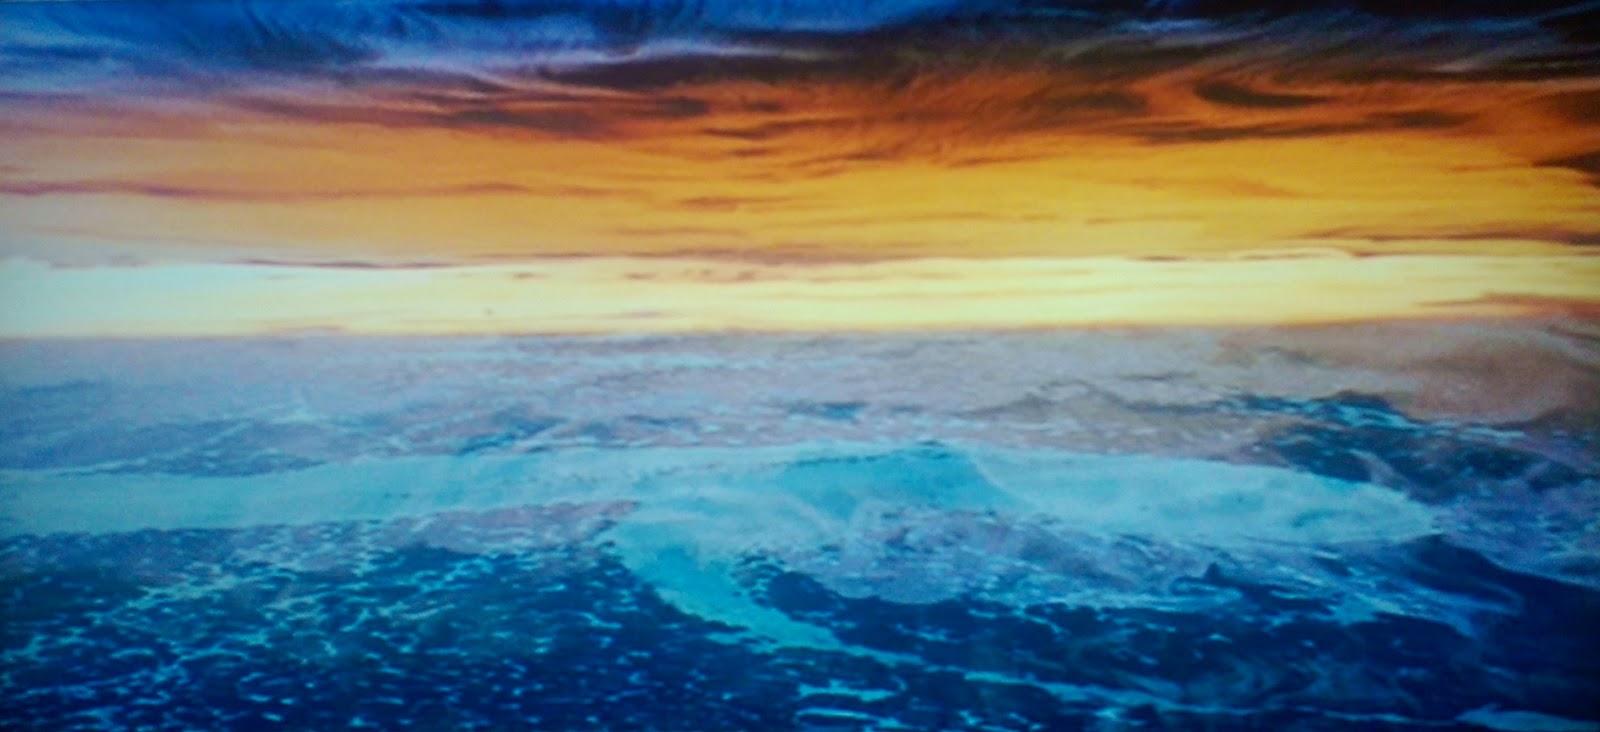 Erik's Choice: Andrei Tarkovsky's 'Солярис' / 'Solaris ...